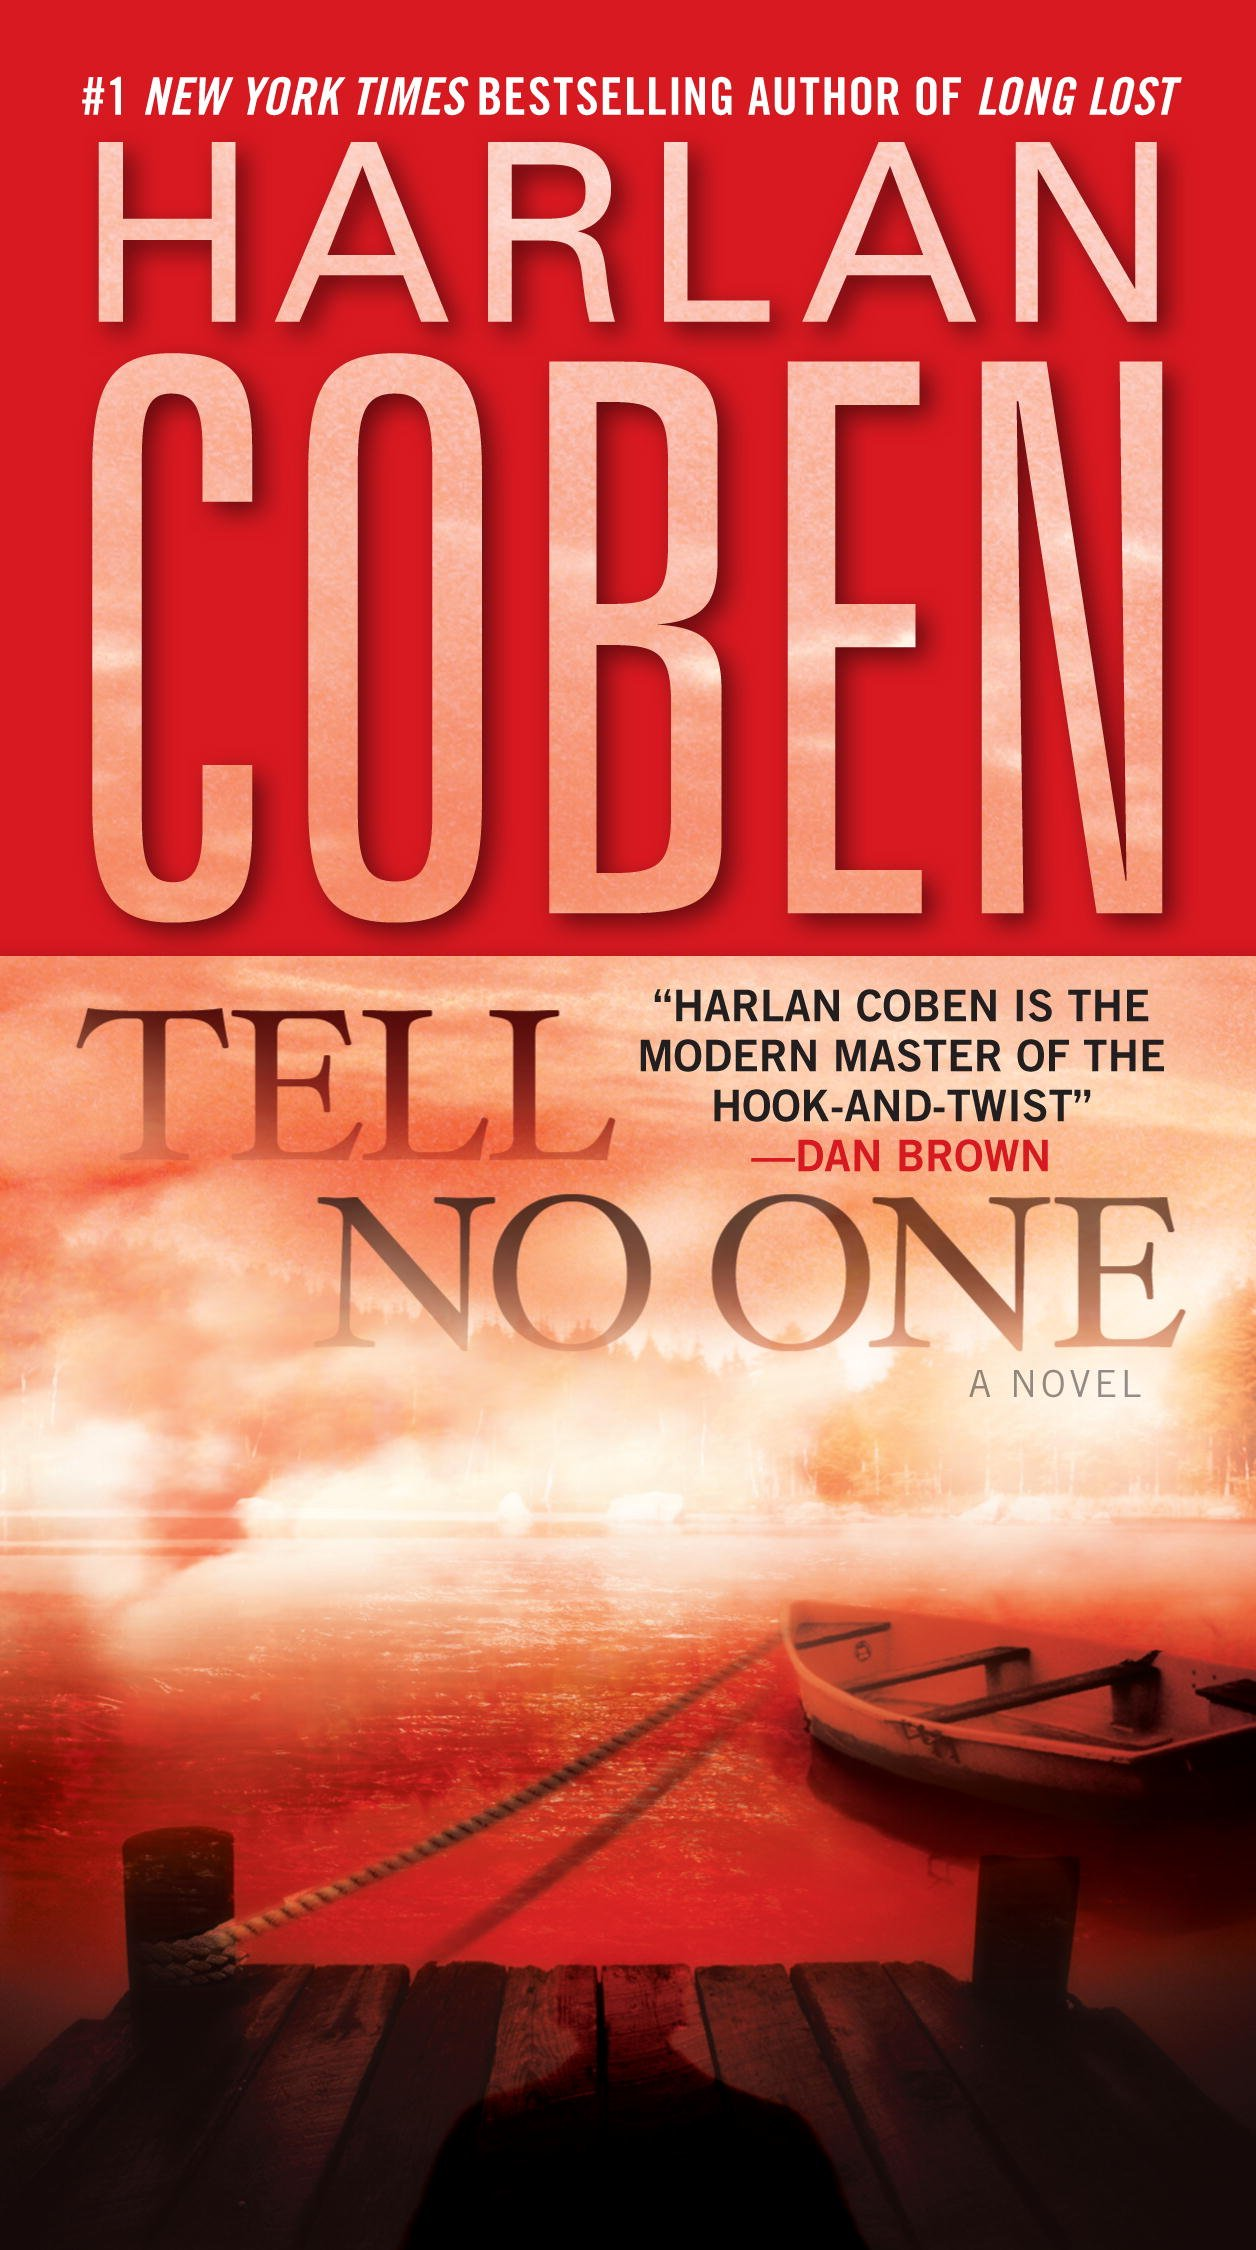 Tell No One Harlan Coben ebook